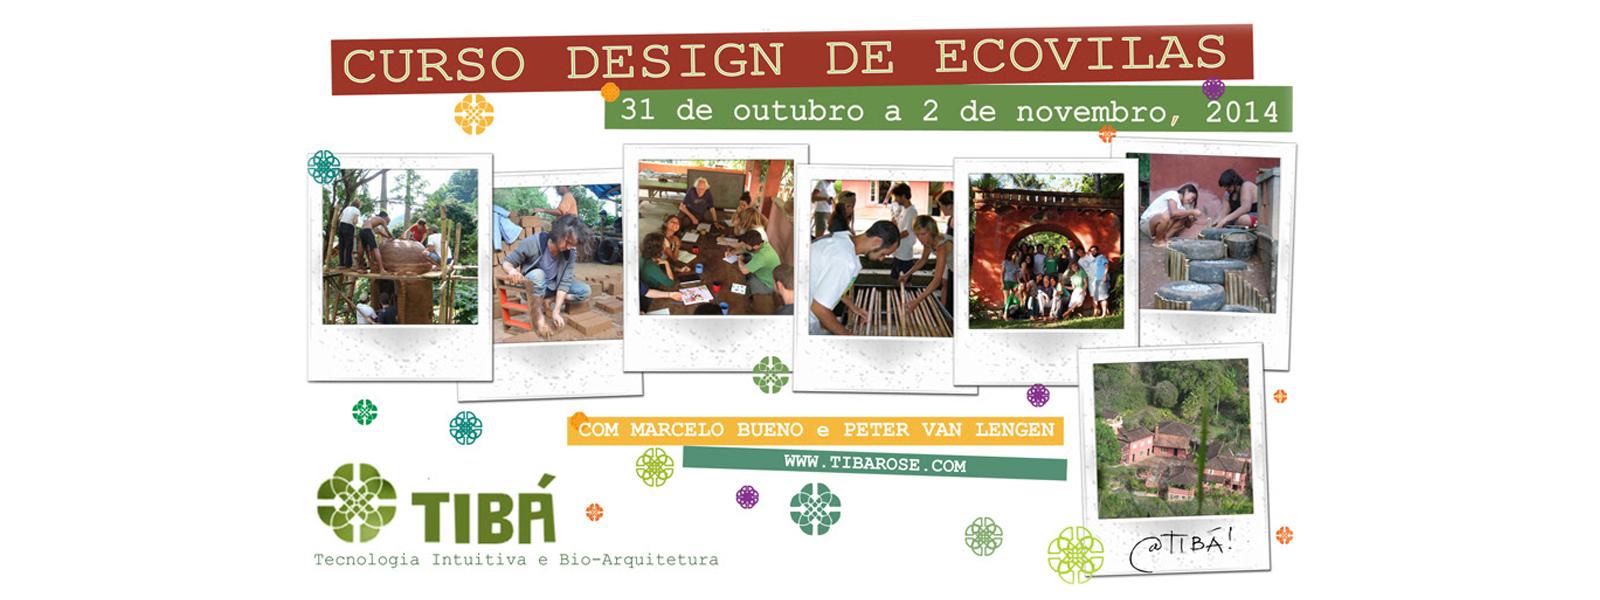 design-ecovilas-curso-tiba